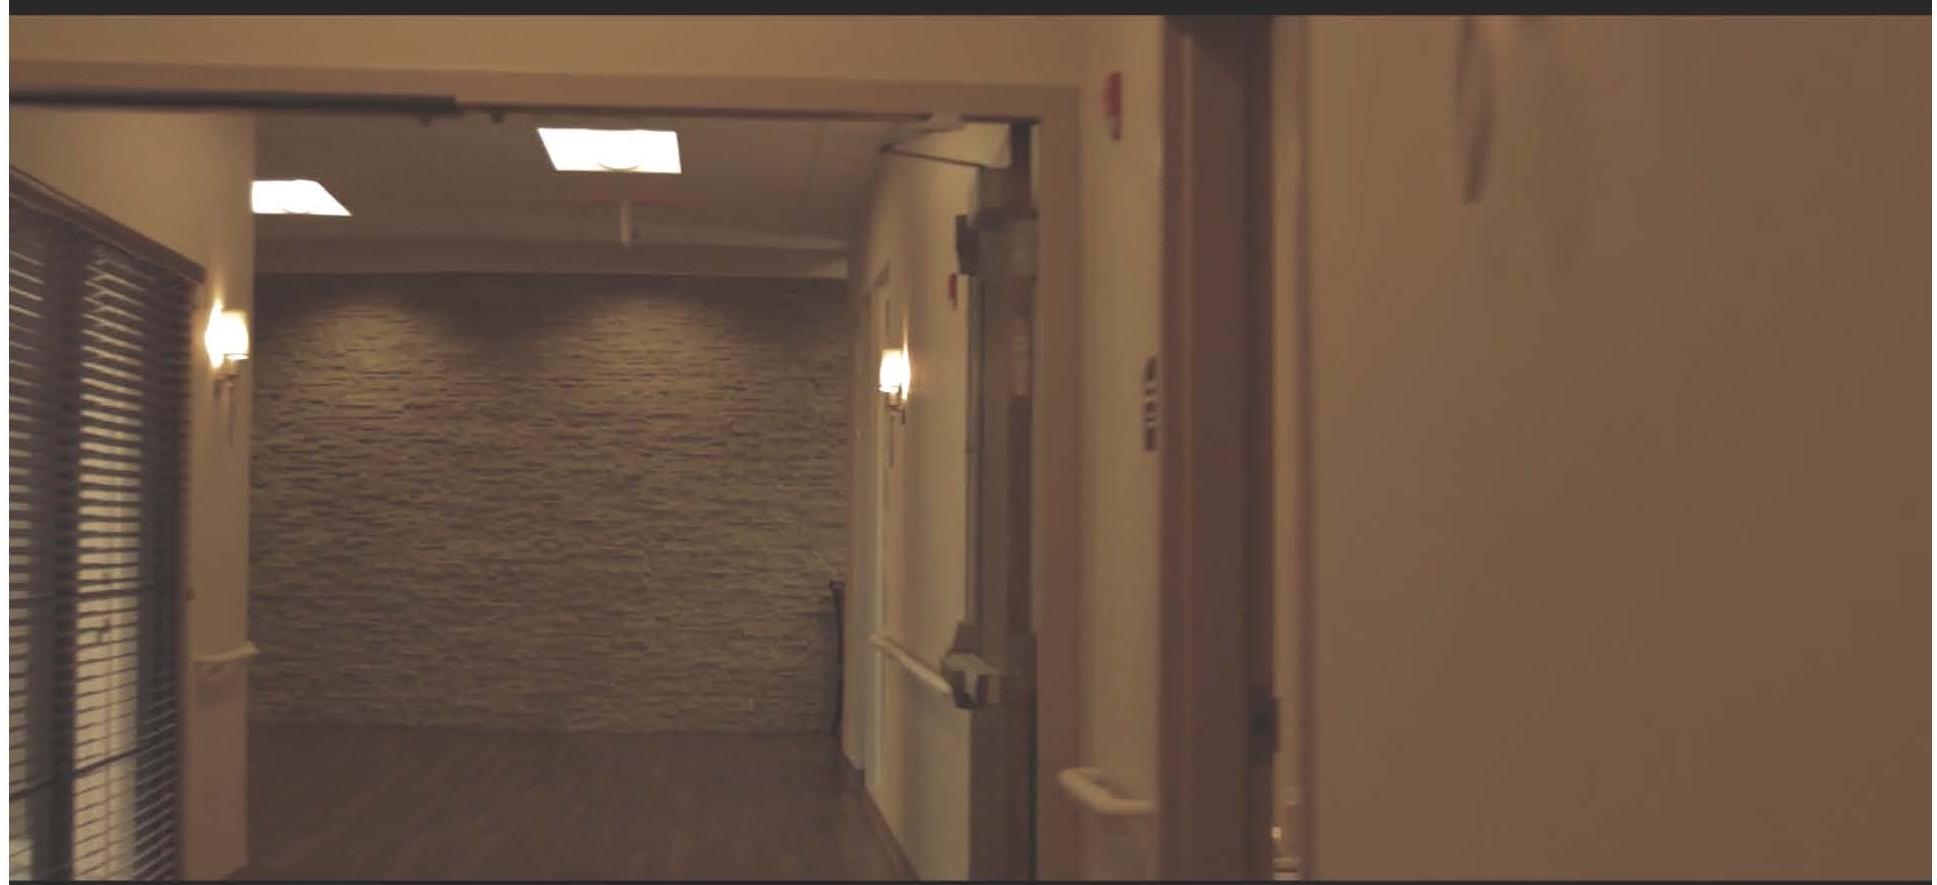 Mentis Neuro - El Paso Location Virtual Tour-HD on Vimeo10